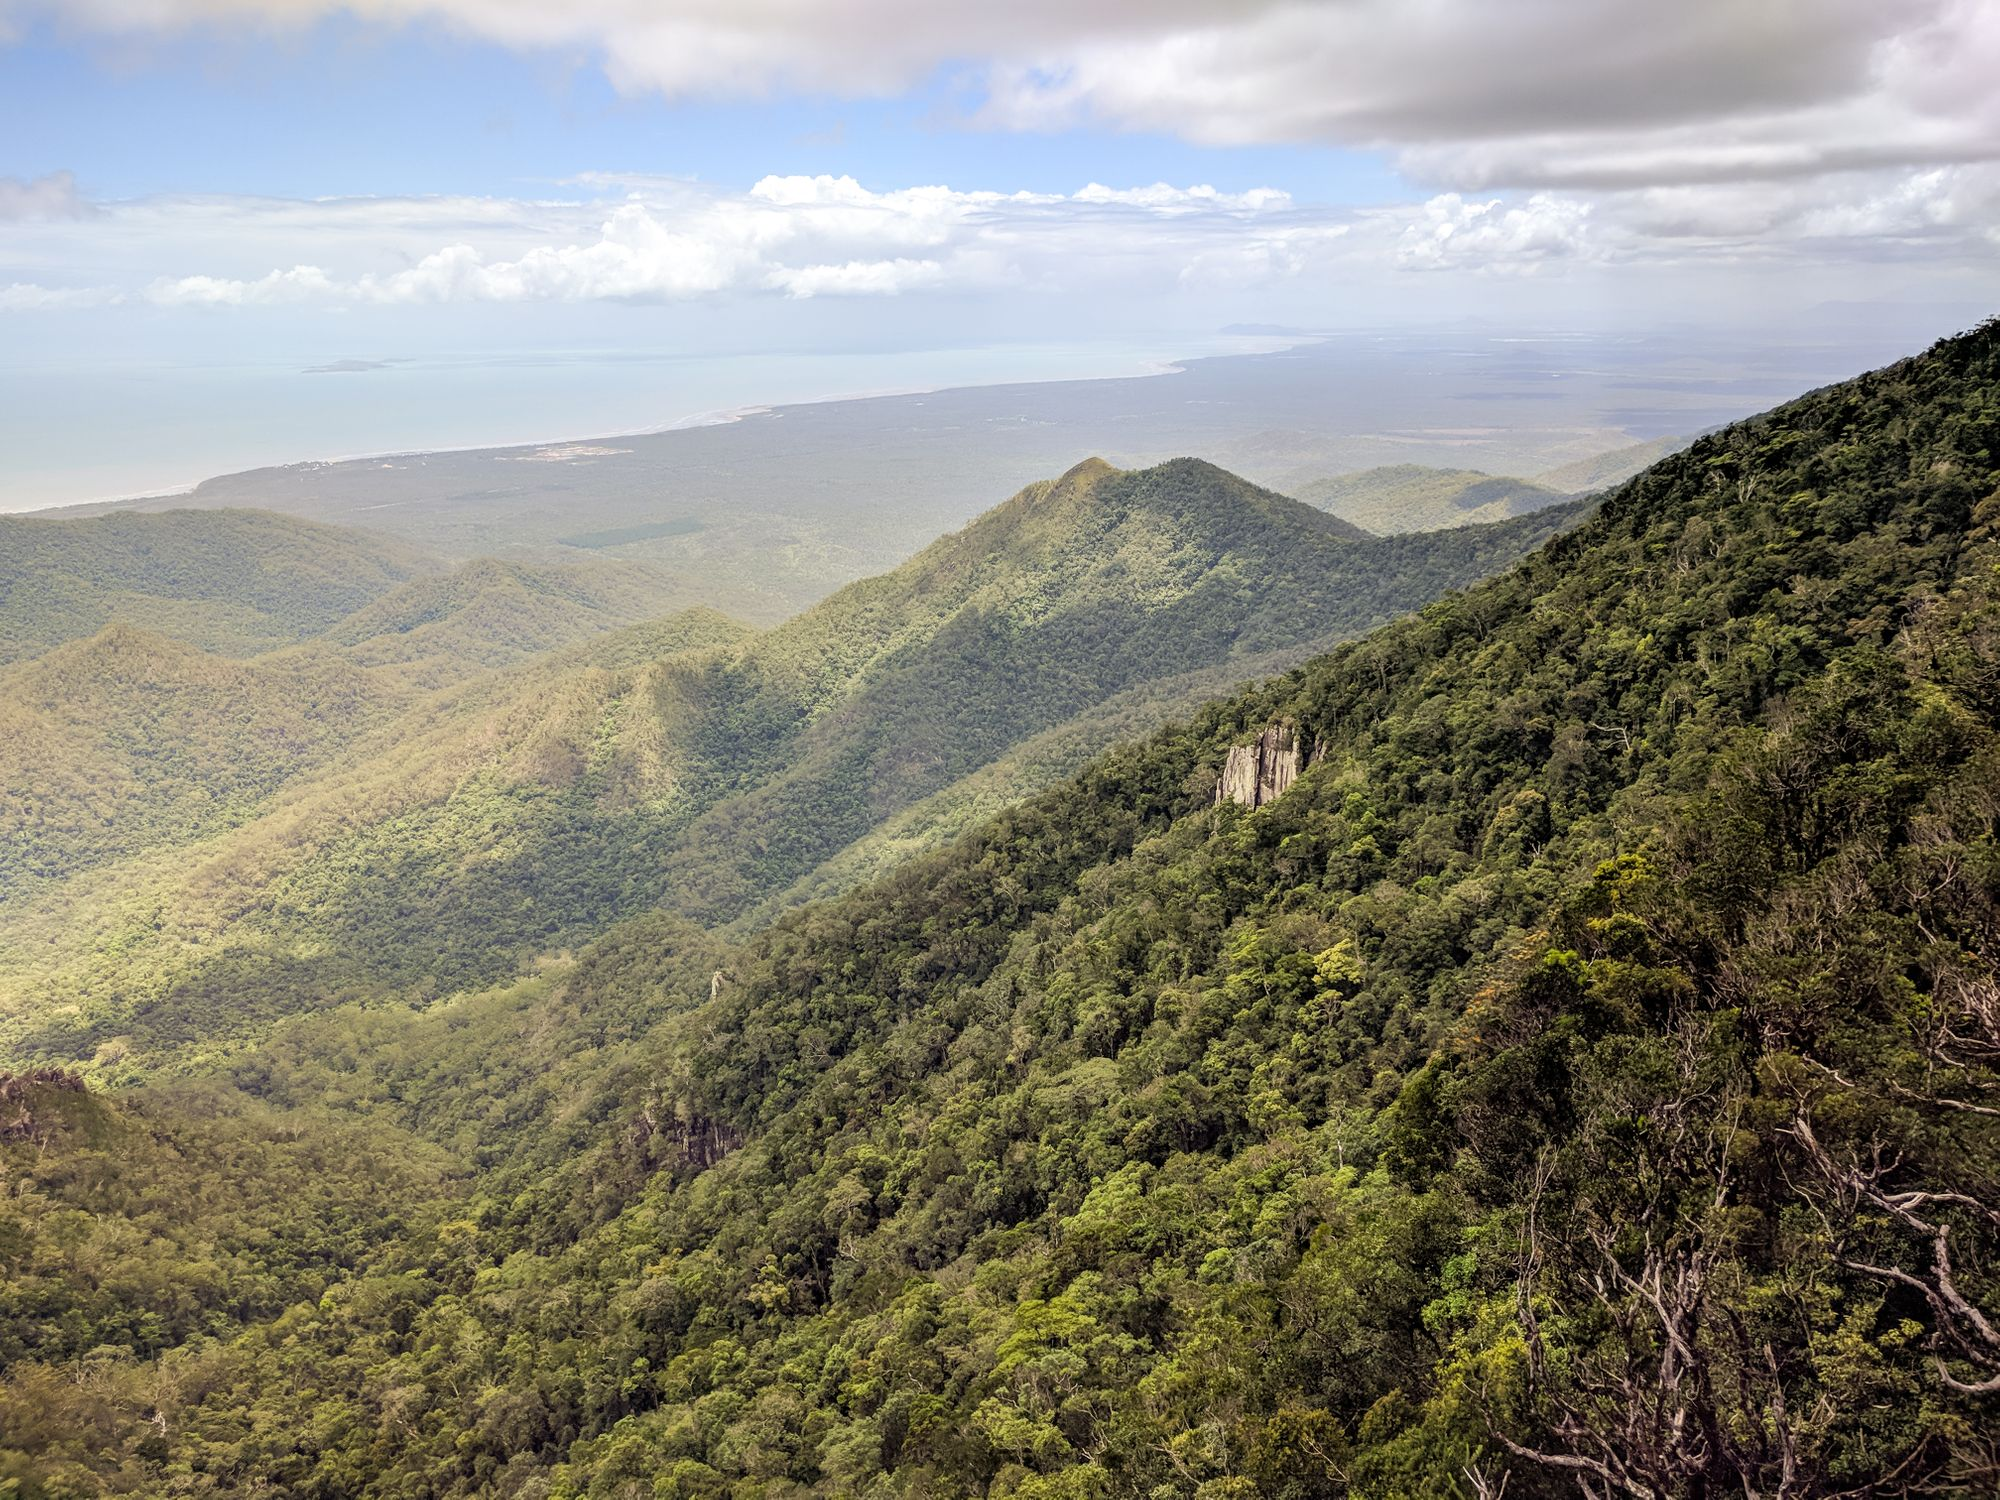 Mount Halifax, Paluma Range National Park